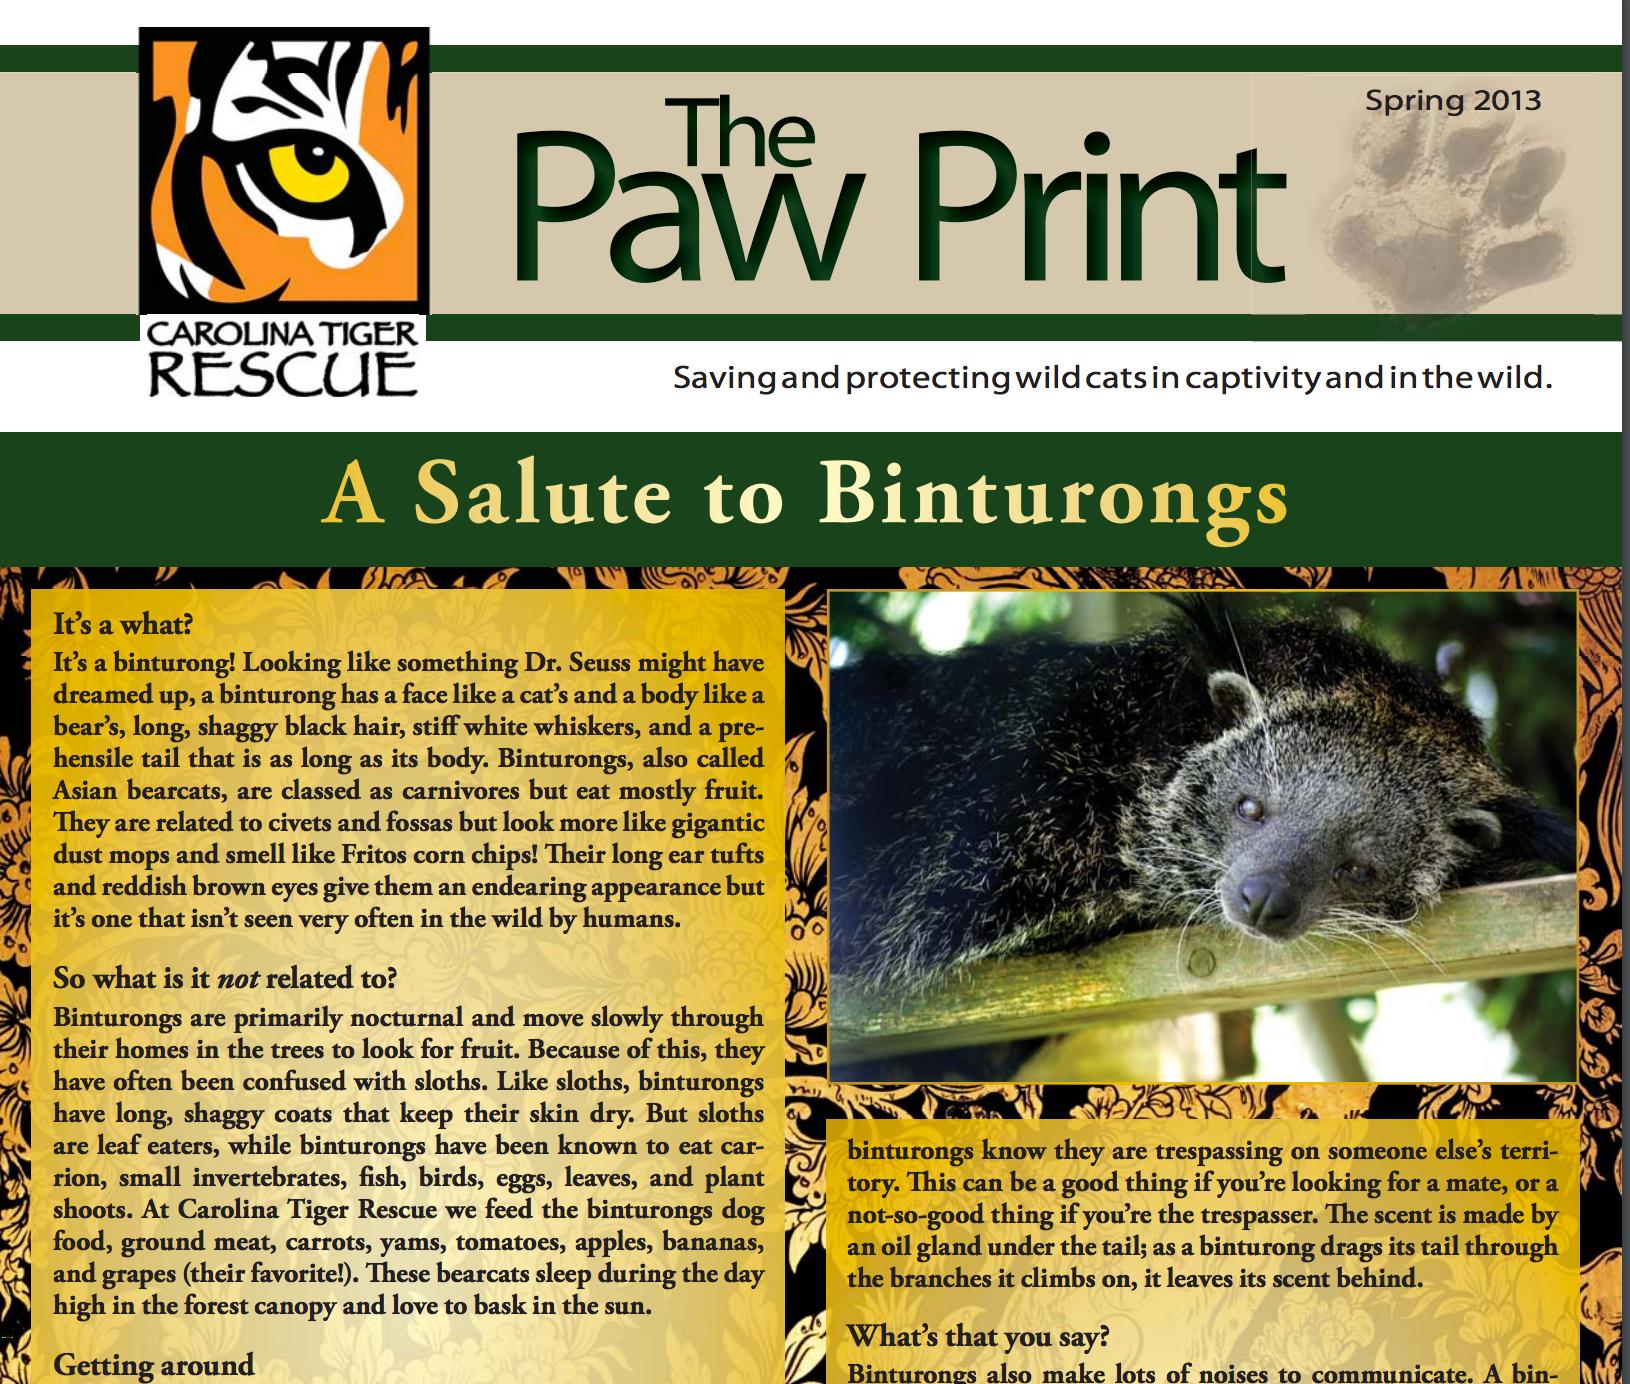 Spring 2013 Paw Print